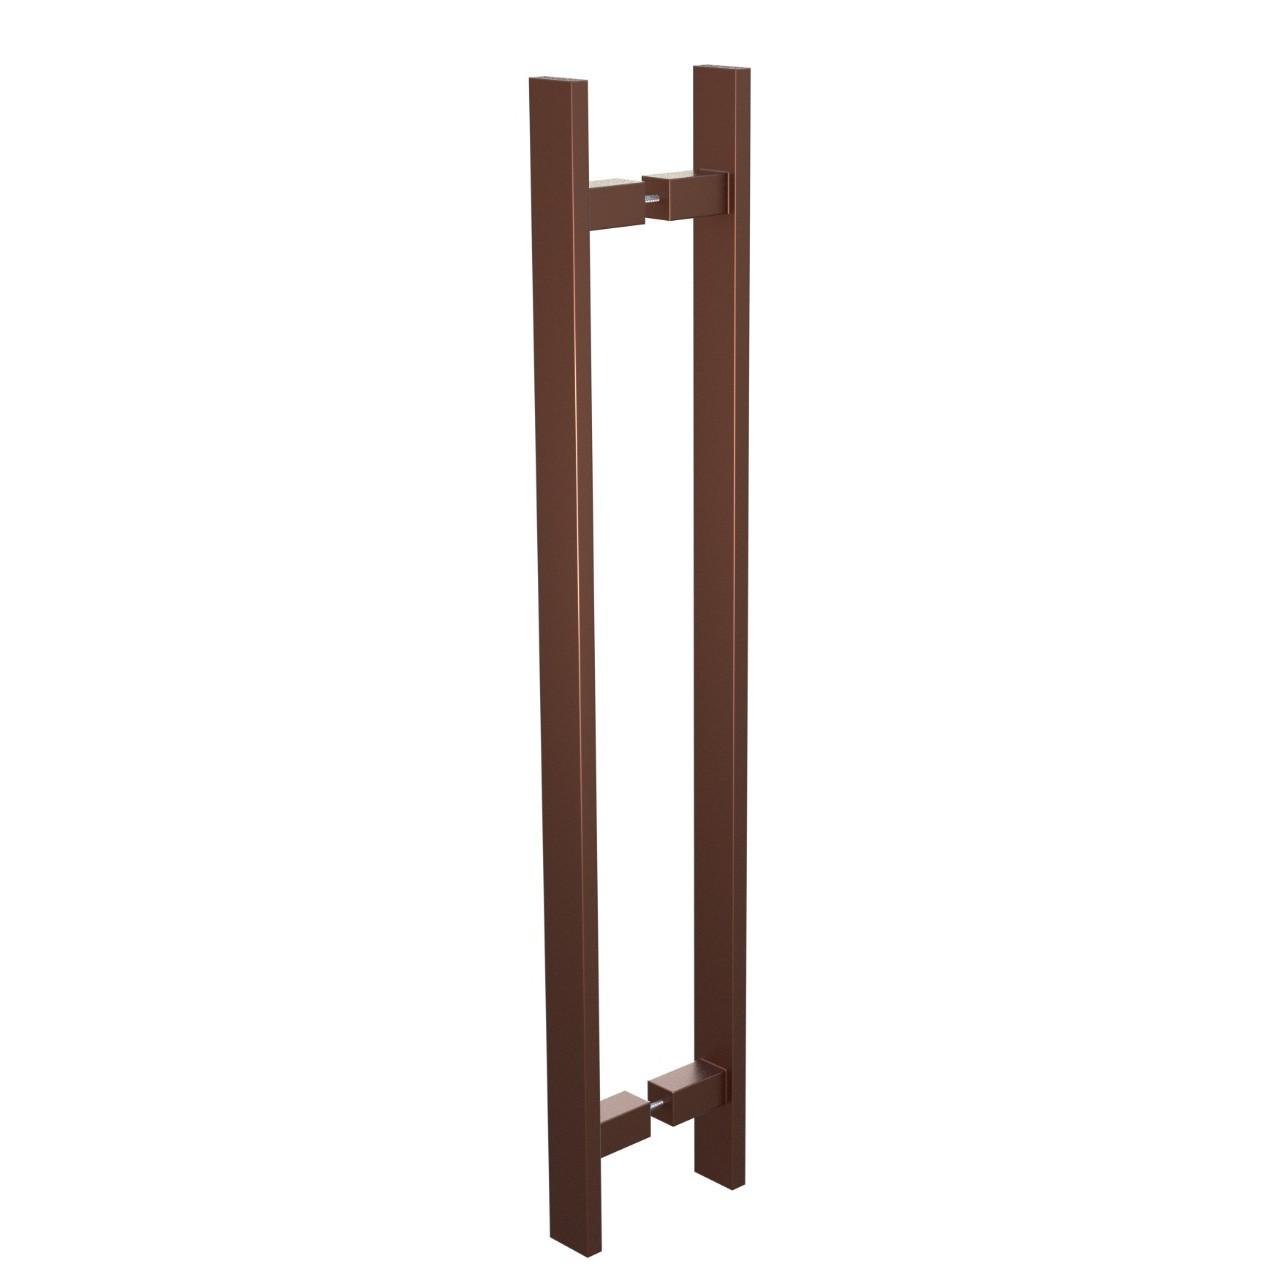 Puxador de Portas Sobrepor Aco Inox 40 cm 1 par Trio Bronze - Acobrasil